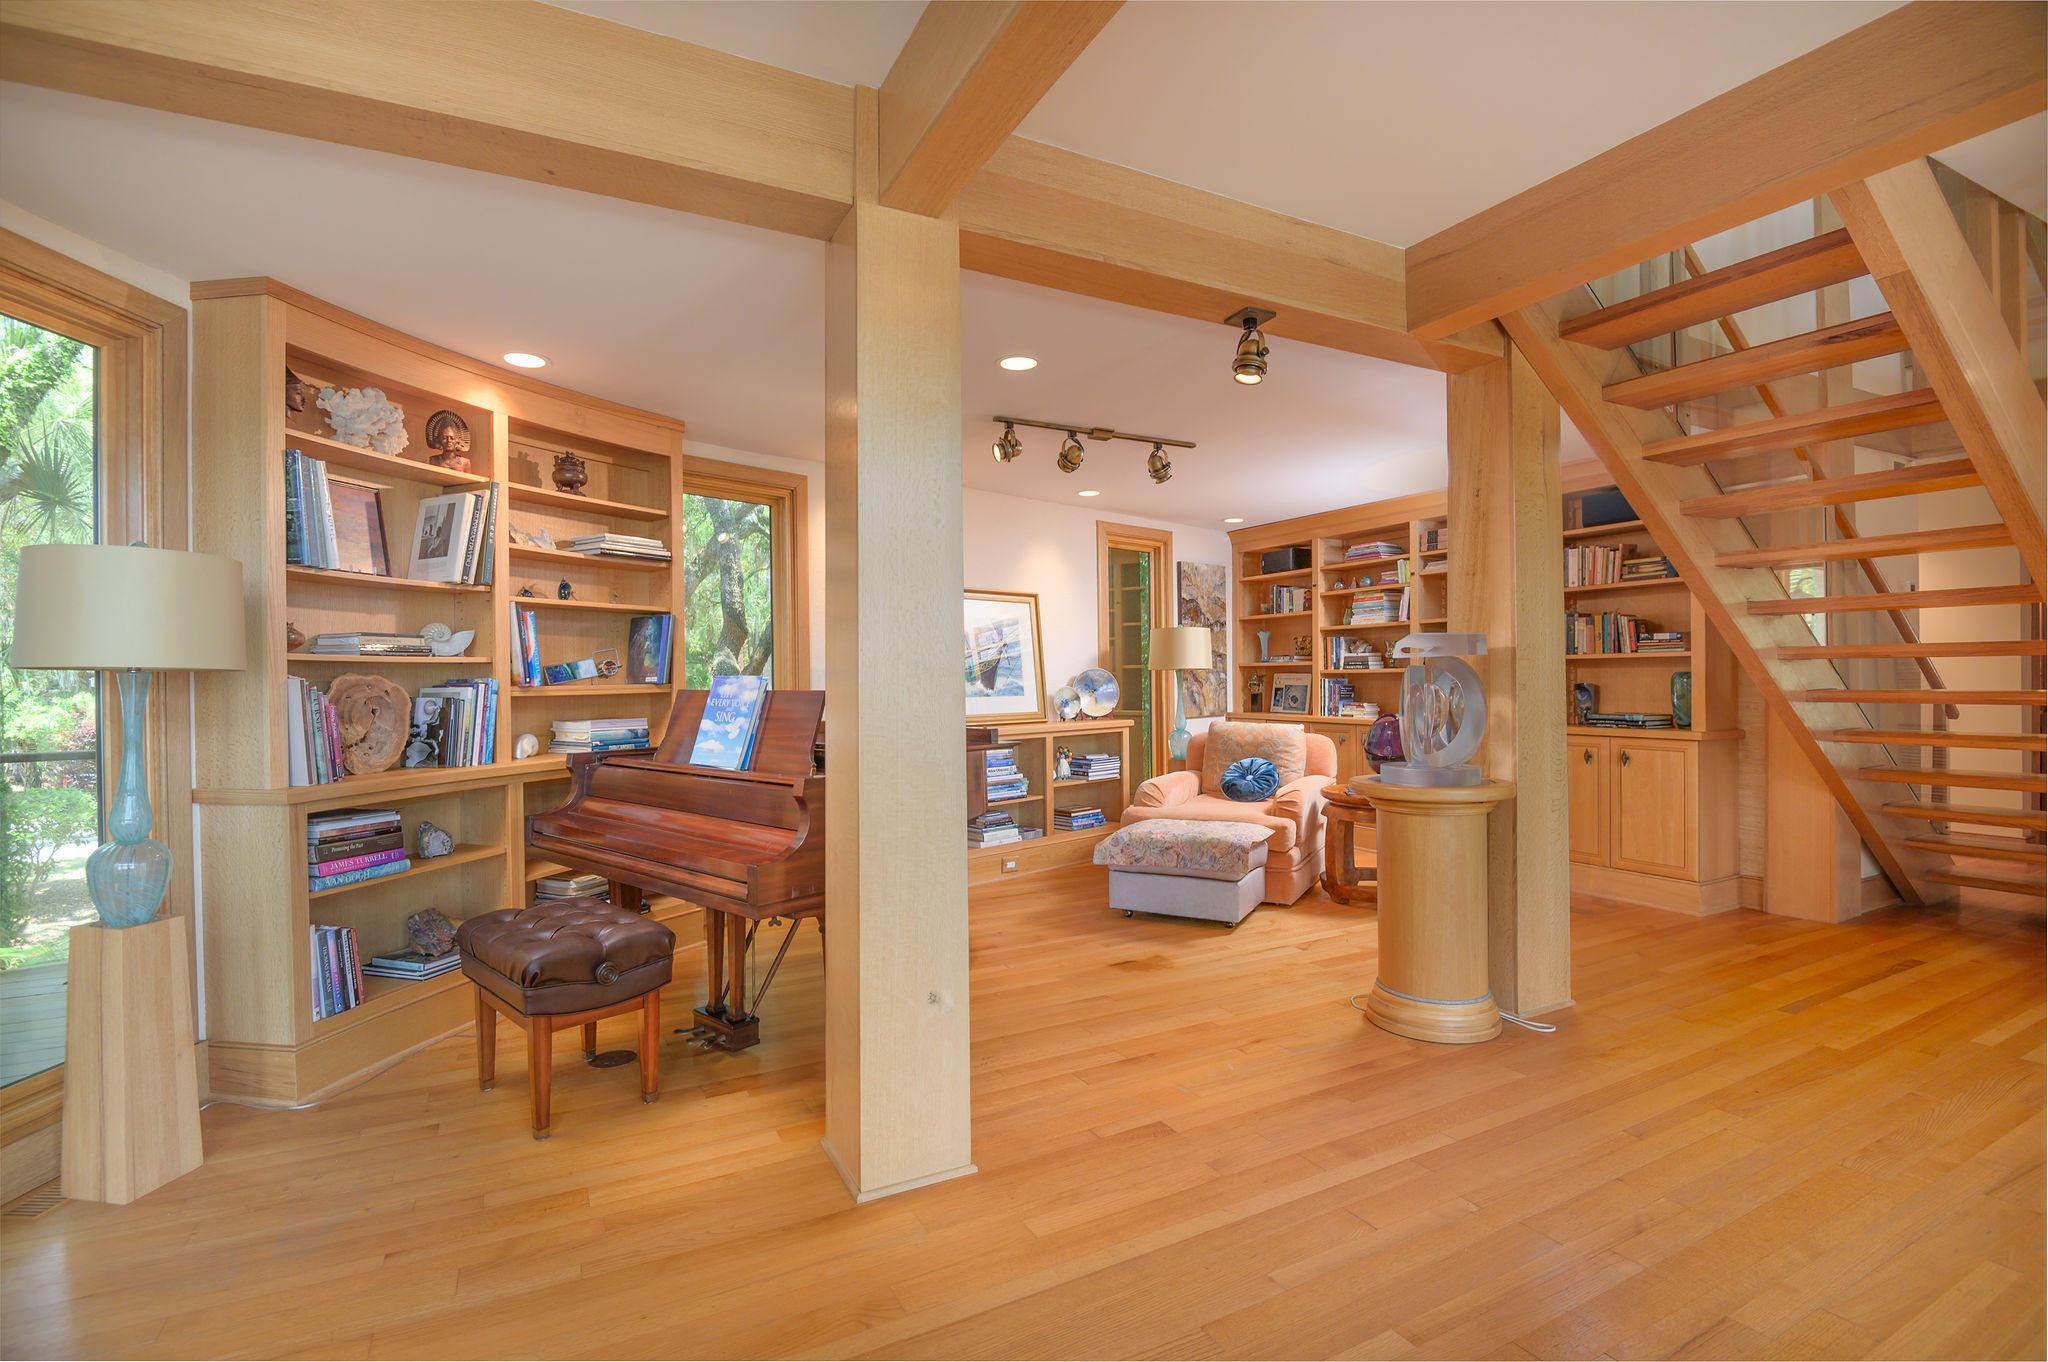 Seabrook Island Homes For Sale - 3087 Marshgate, Seabrook Island, SC - 36